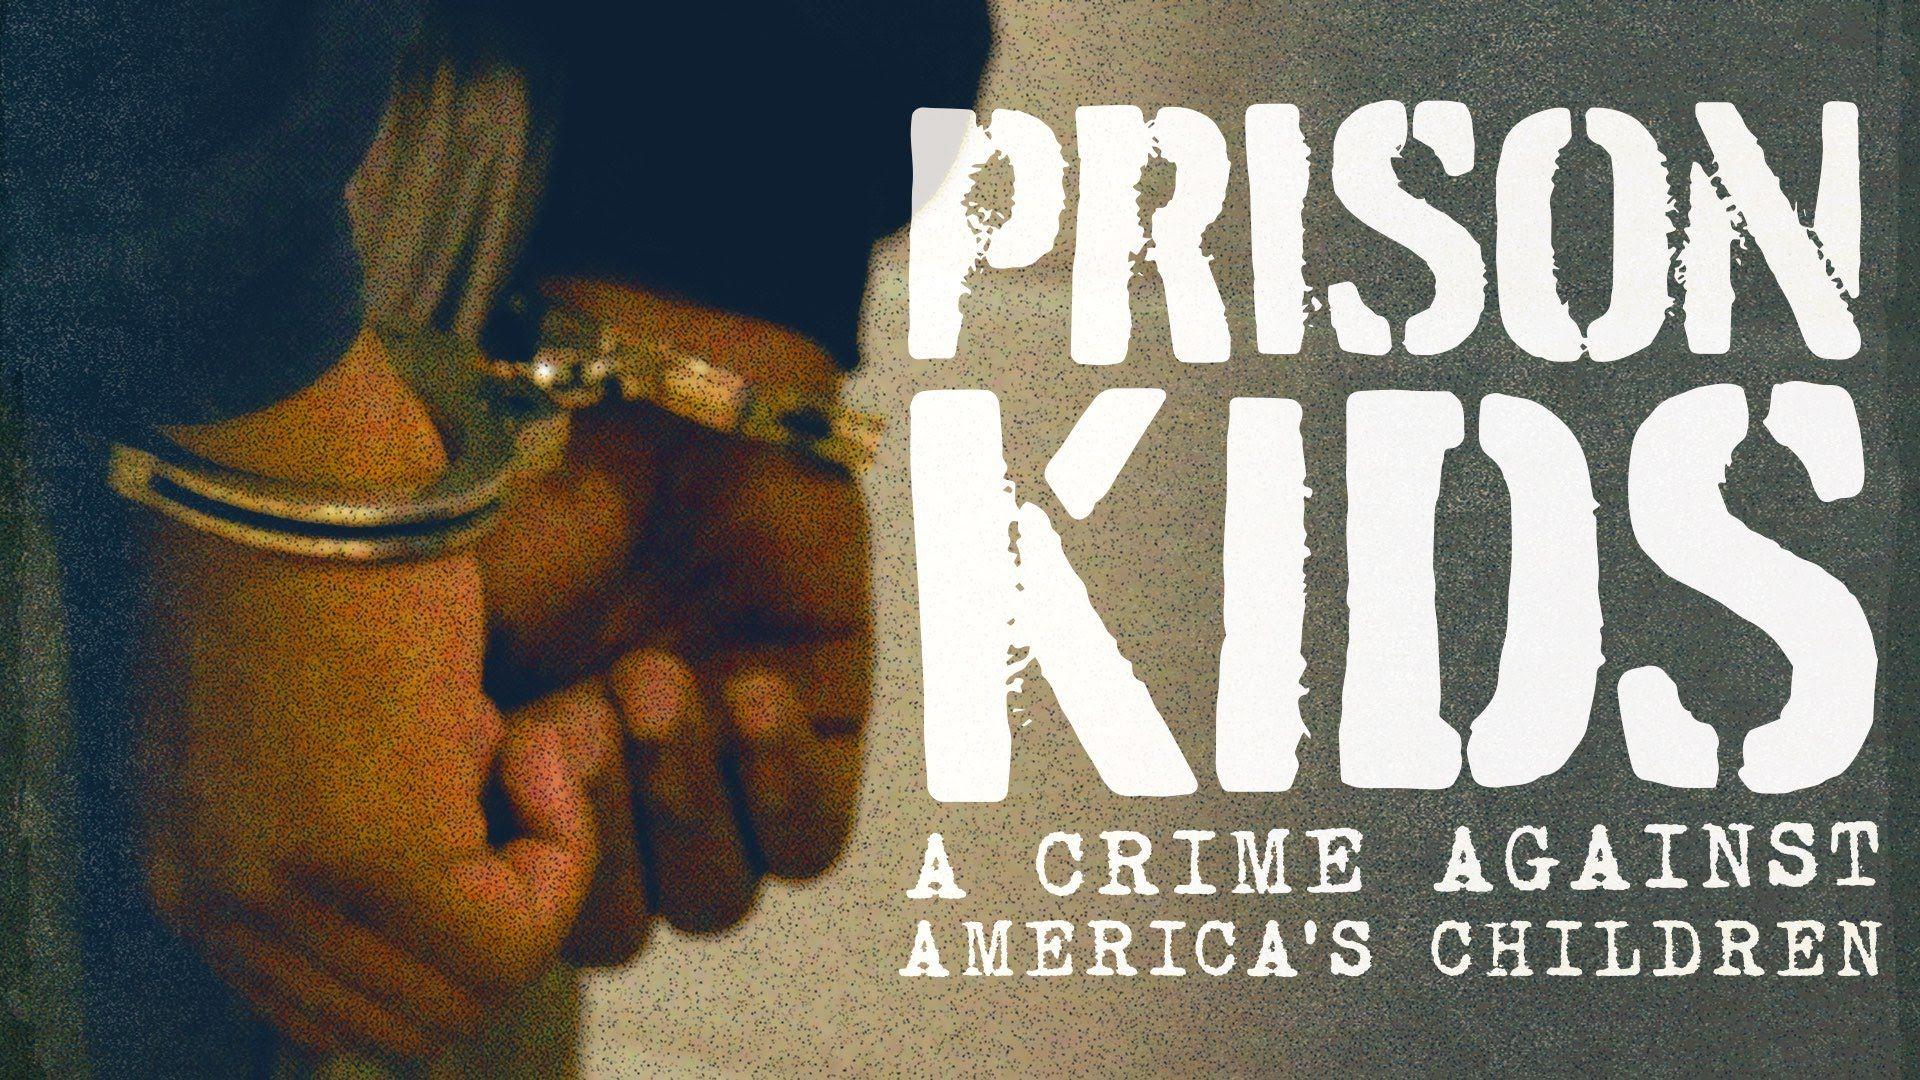 Prison Kids Juvenile Justice In America